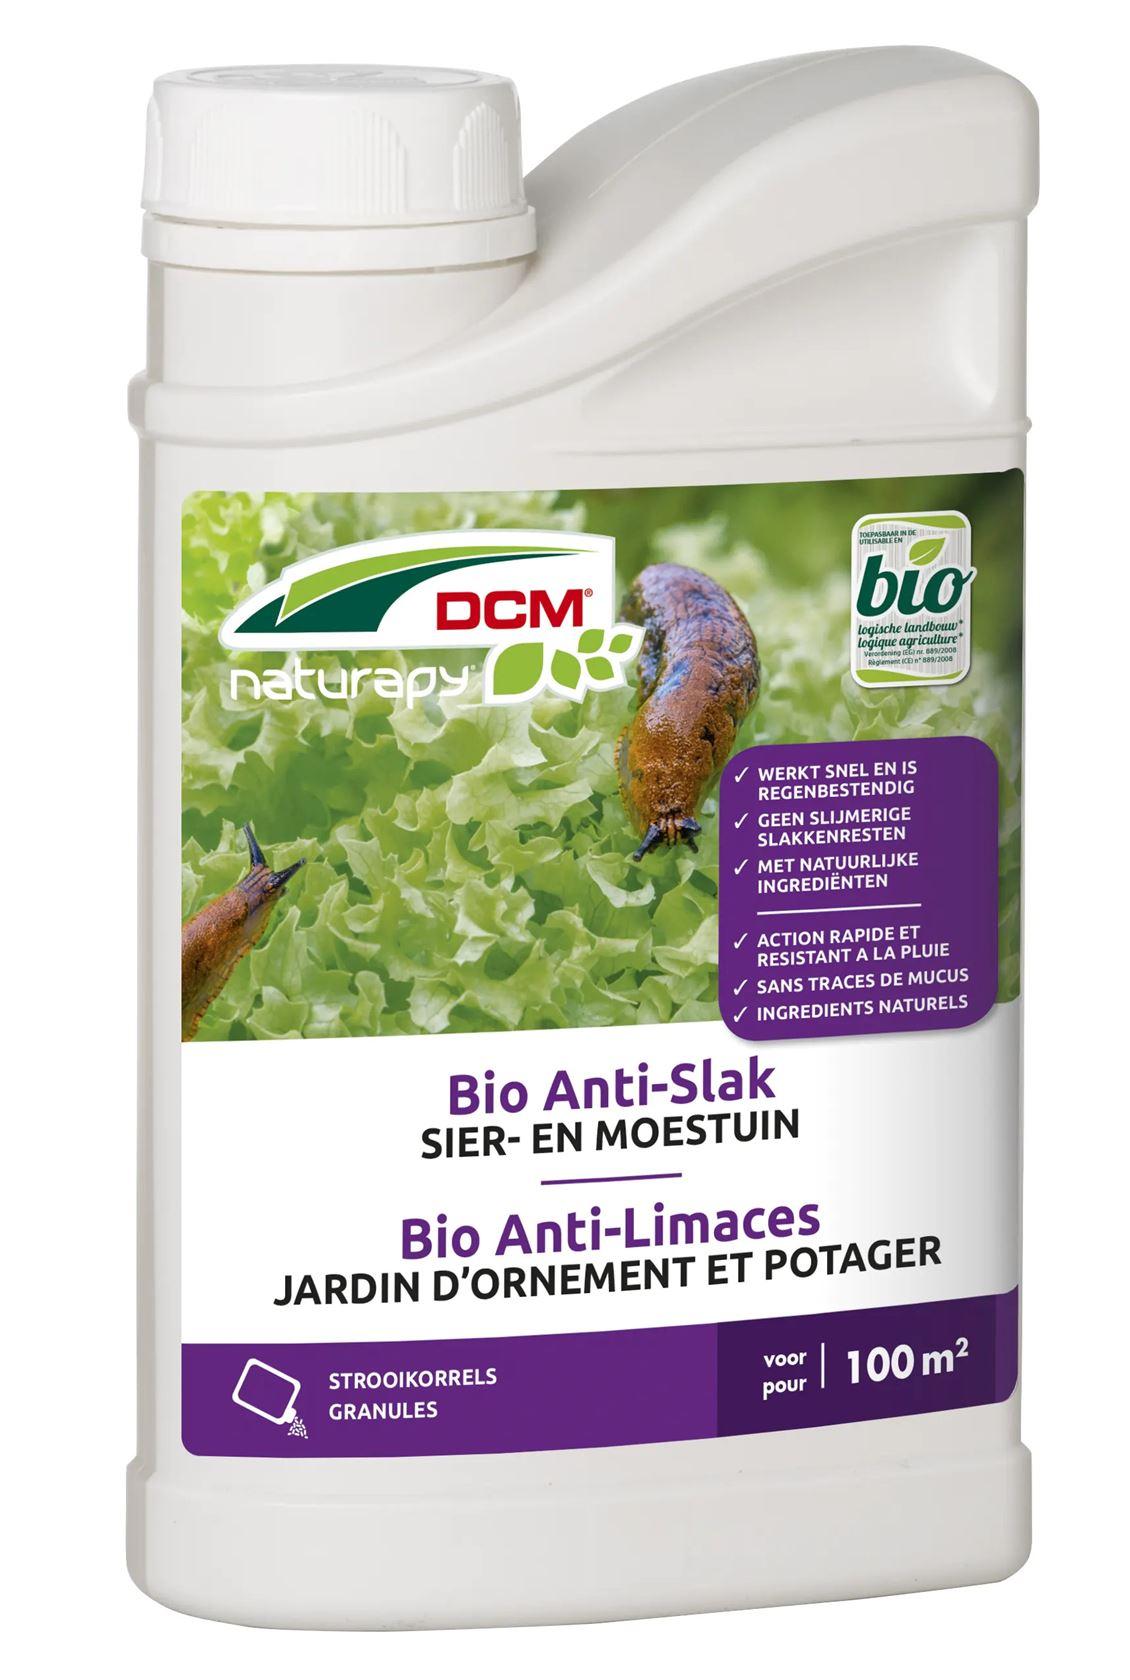 Bio-anti-slak-500gr-100m-Biologische-slakkenkorrels-dmv-ijzerfosfaat